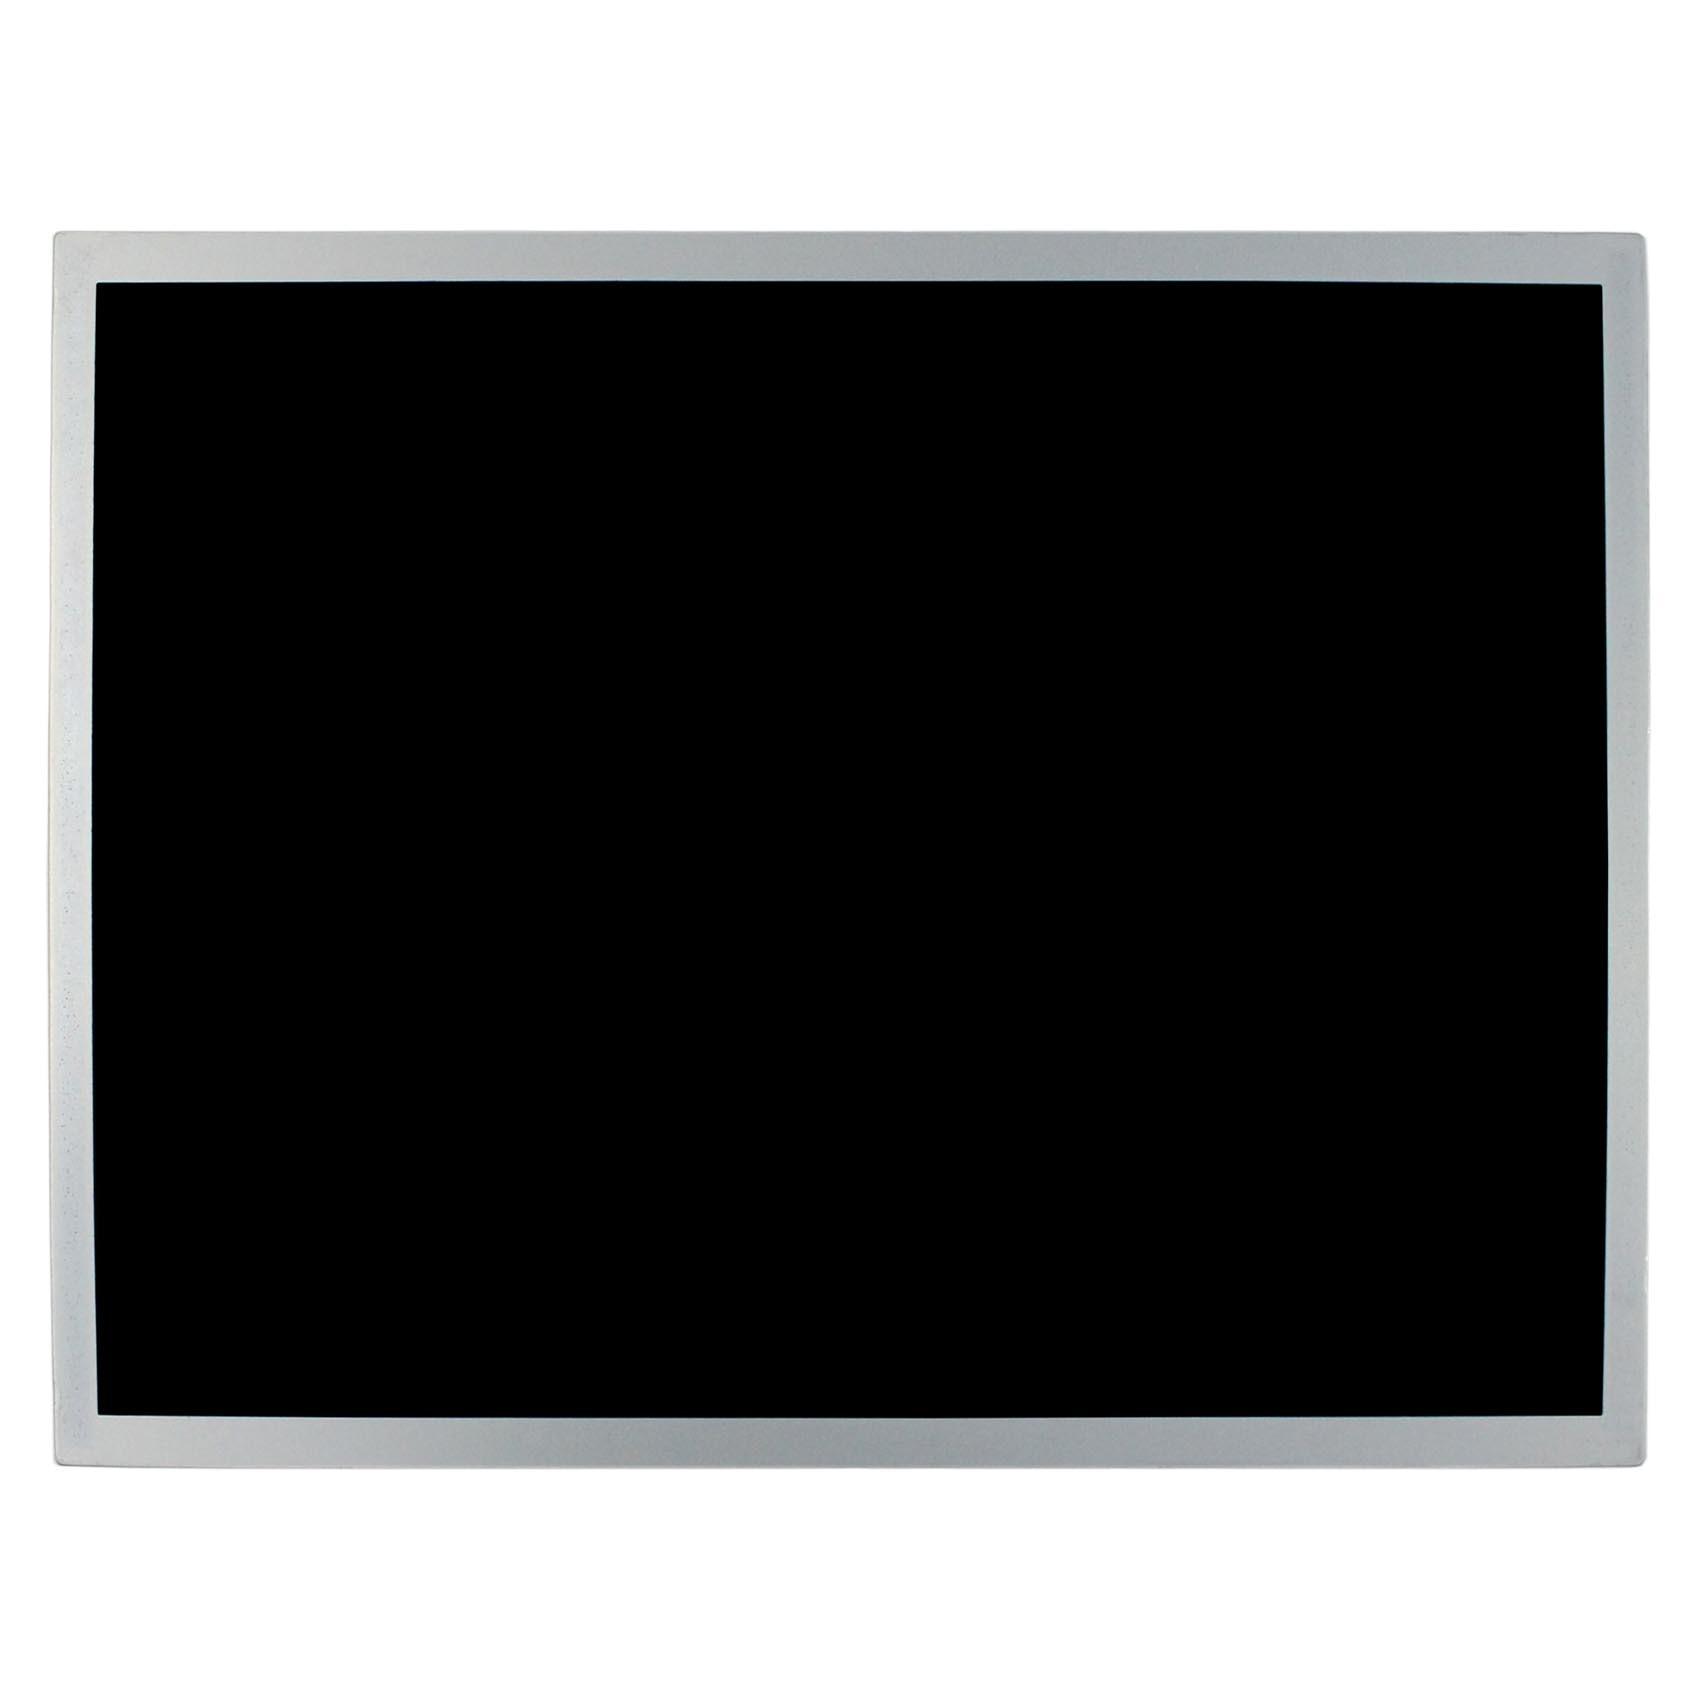 HDMI+VGA+DVI+Audio lcd controller board NT68676+15inch LQ150X1LG96 1024*768 1050cd/m2 industrial  lcd panel